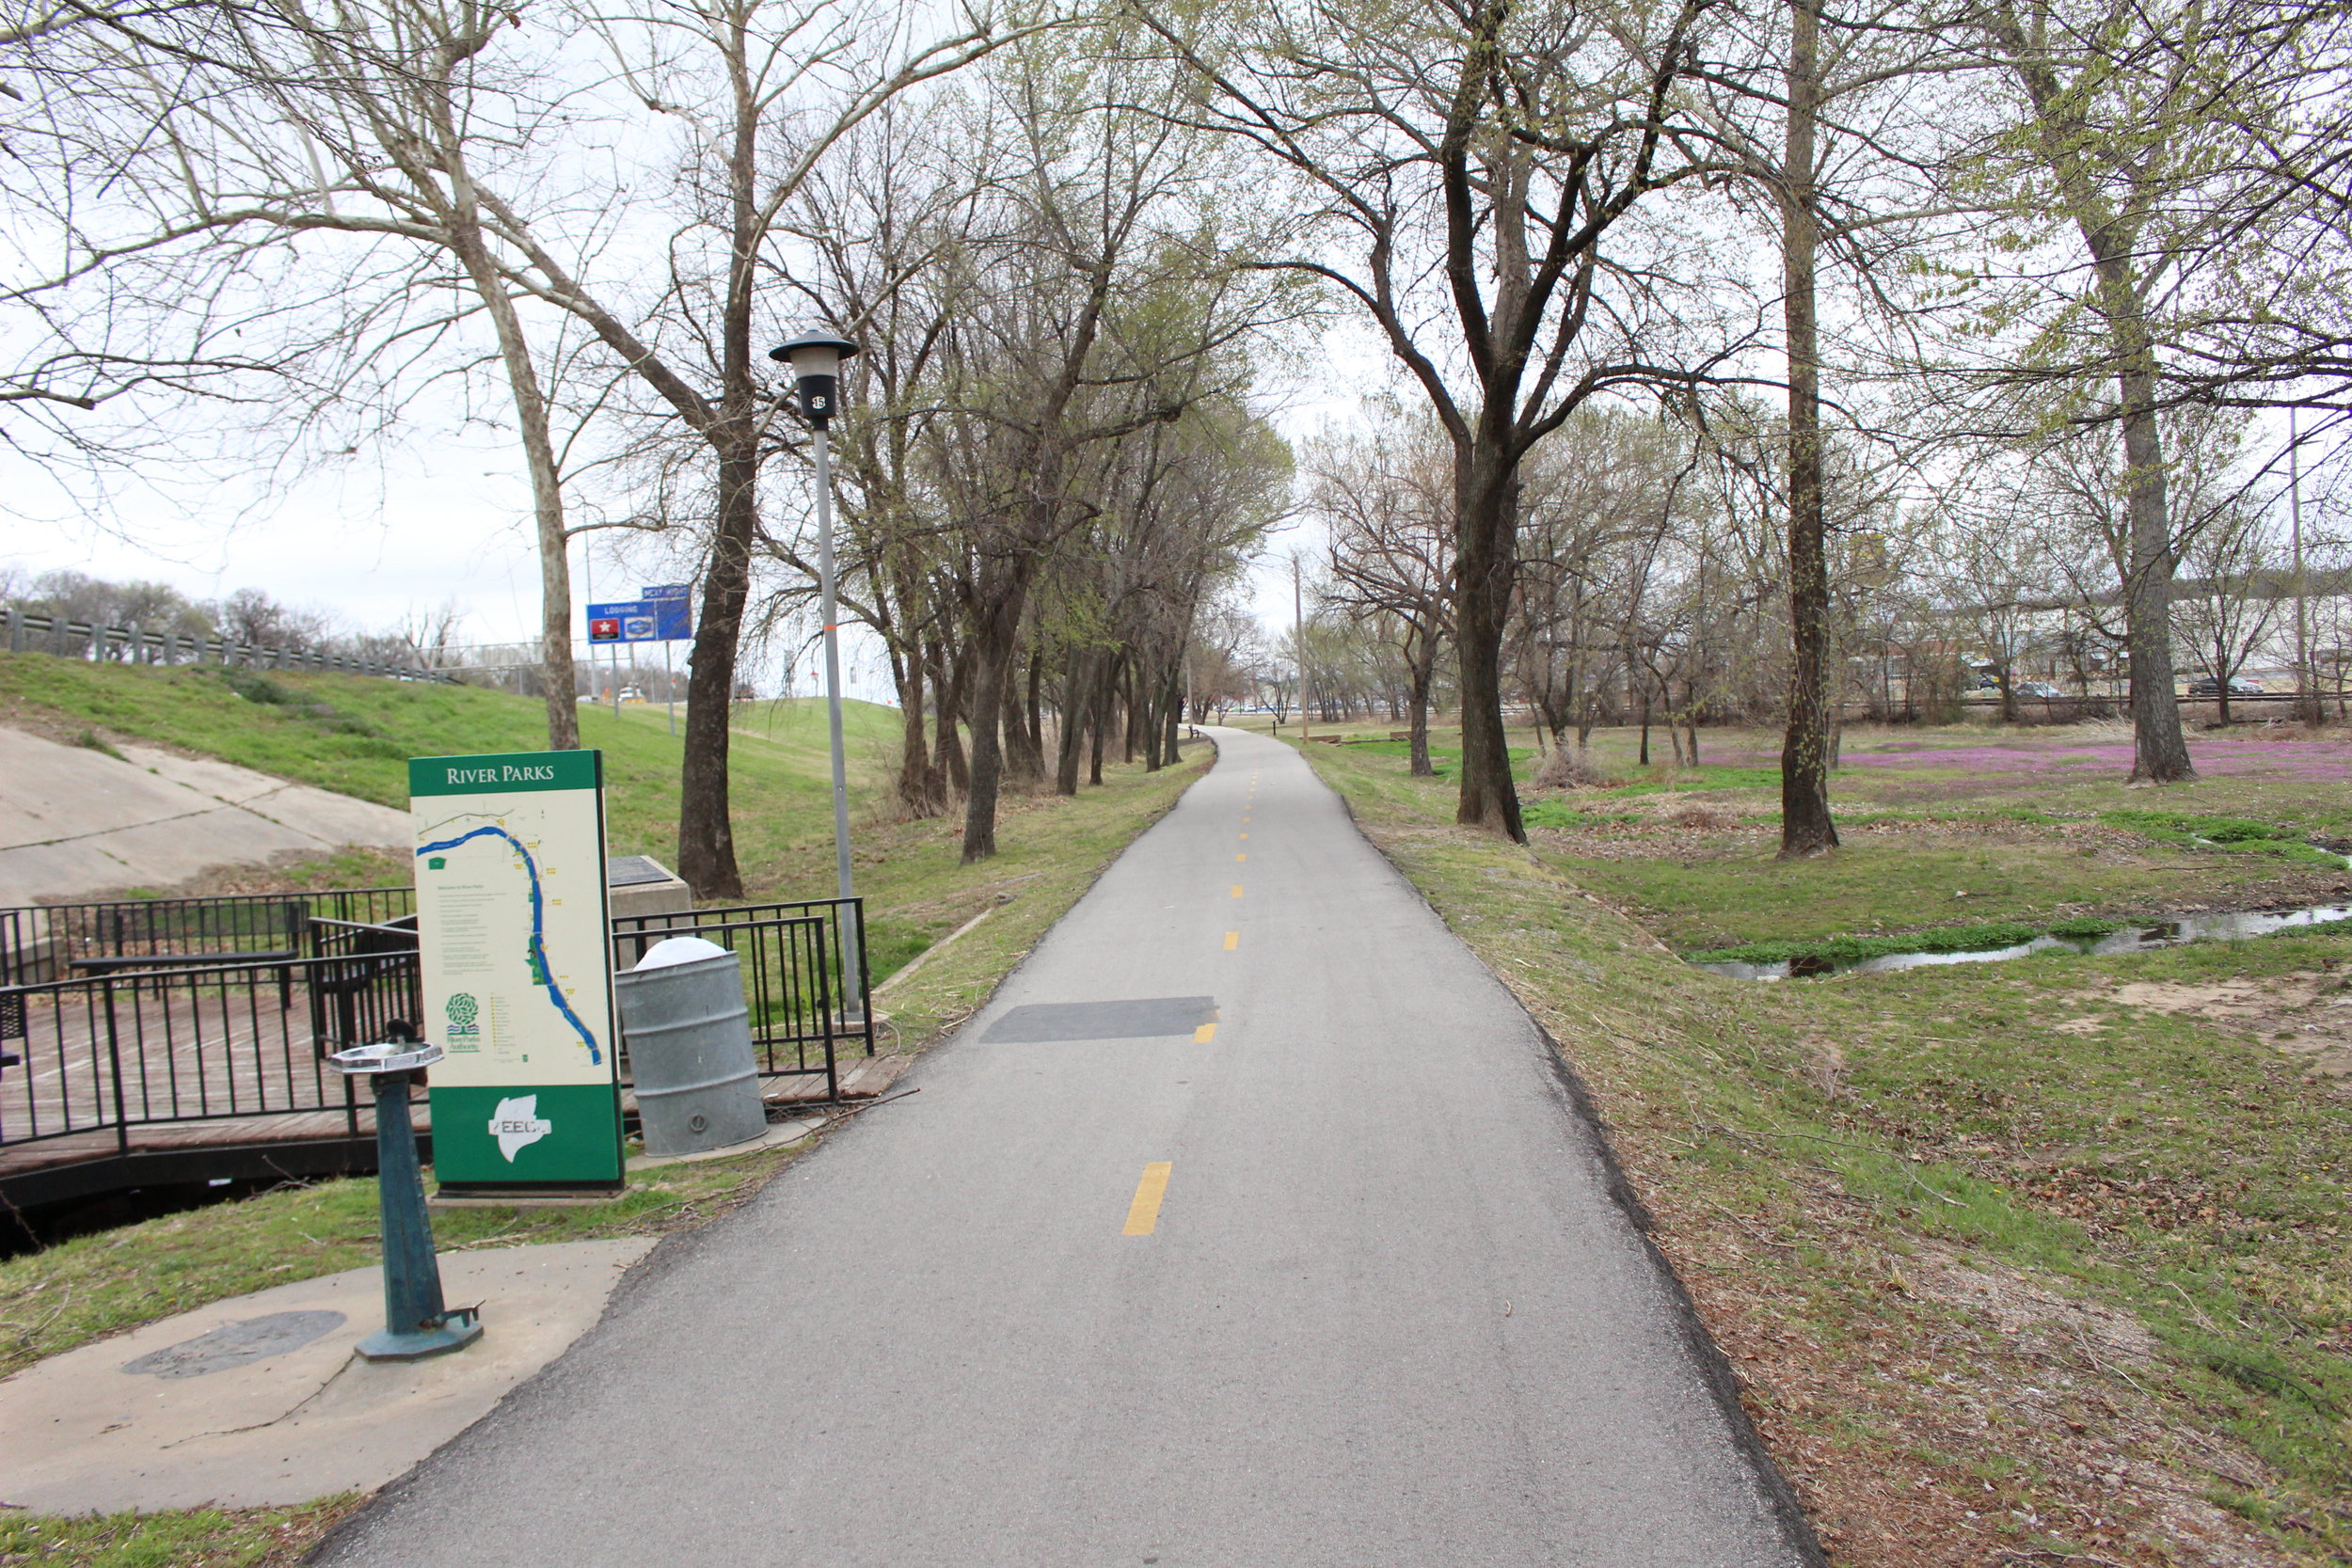 centennial park / Katy trail 651 east charles page boulevard